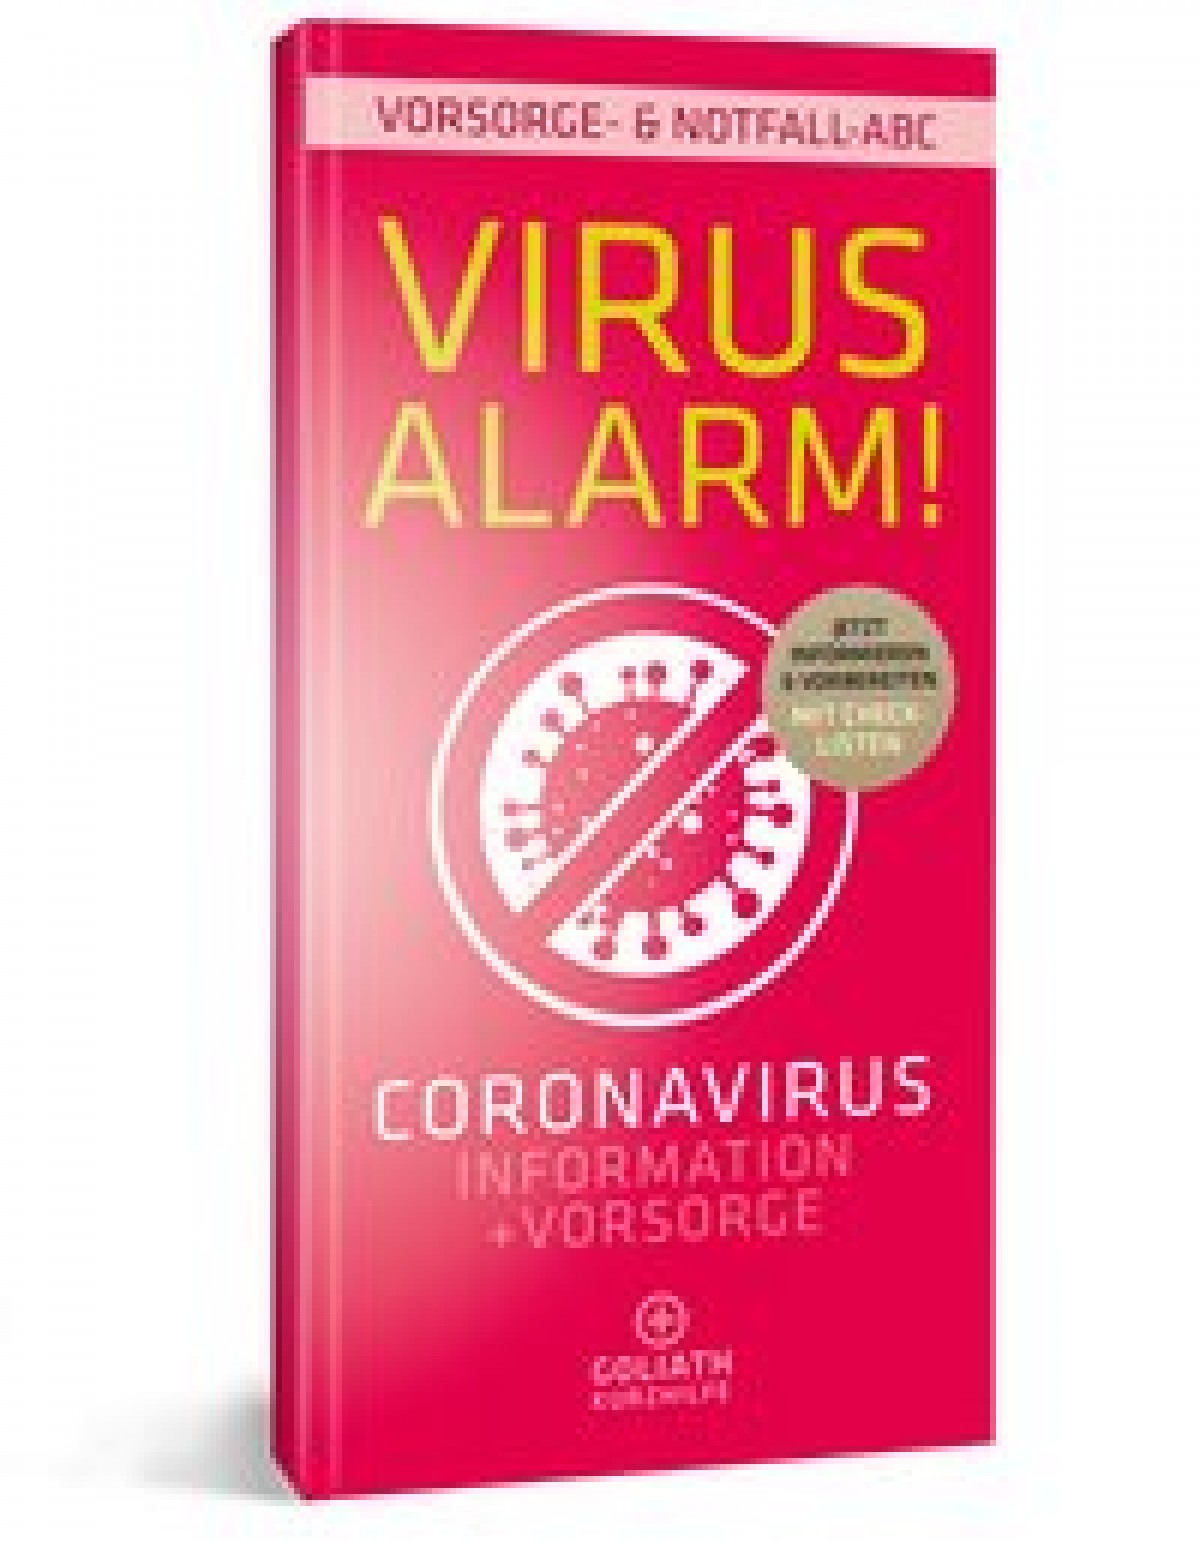 Buch Virus Alarm! Coronavirus Information + Vorsorge